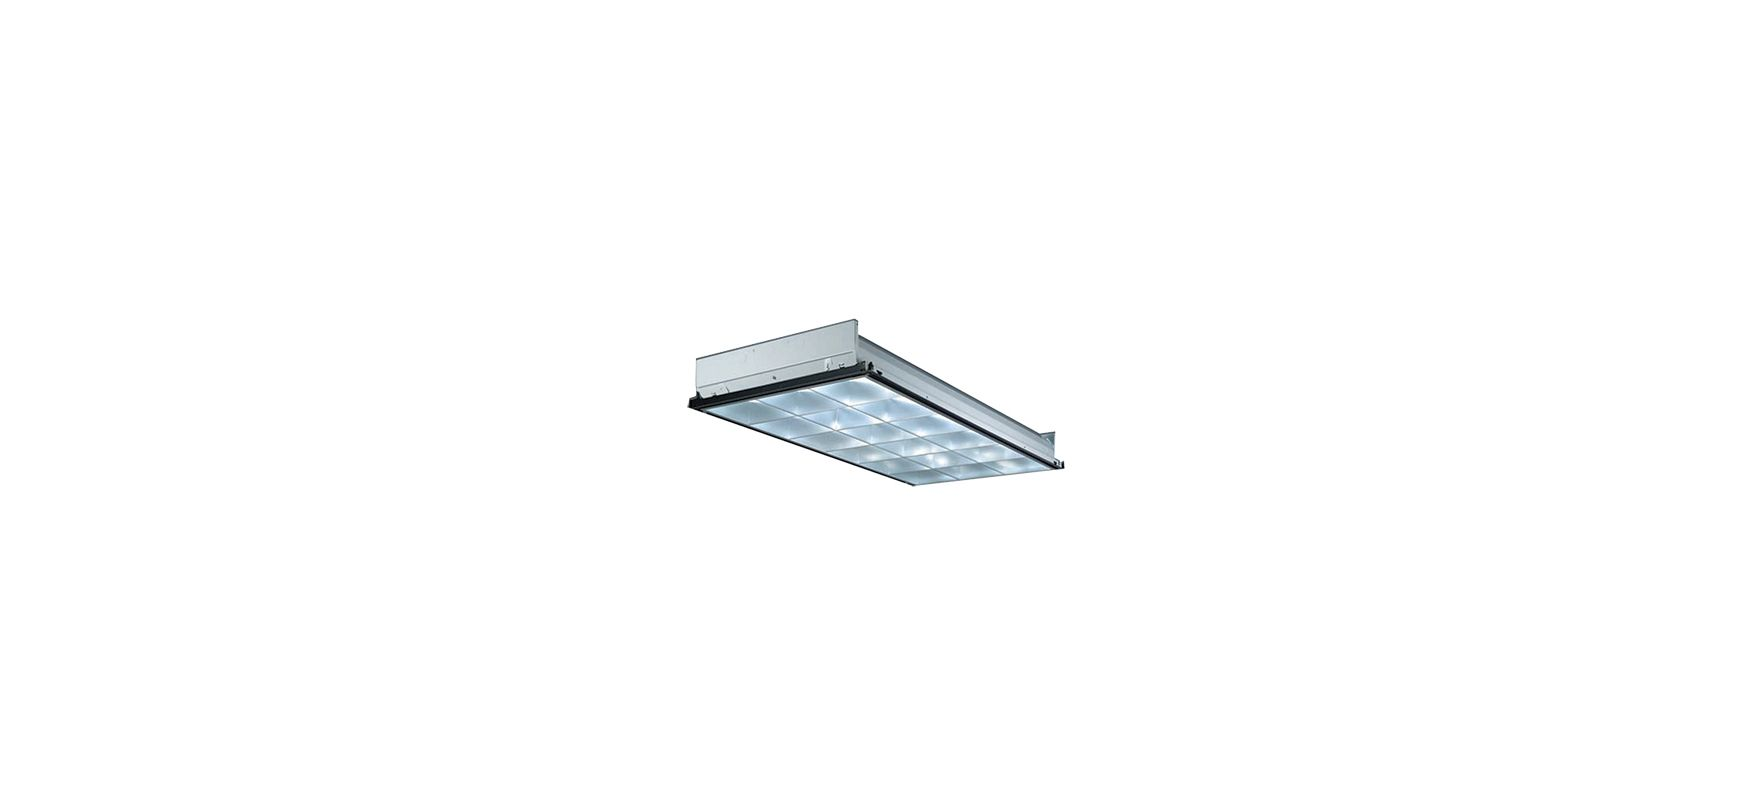 Lithonia Lighting PT3L MV 3 Light Linear Recessed Fluorescent Fixture